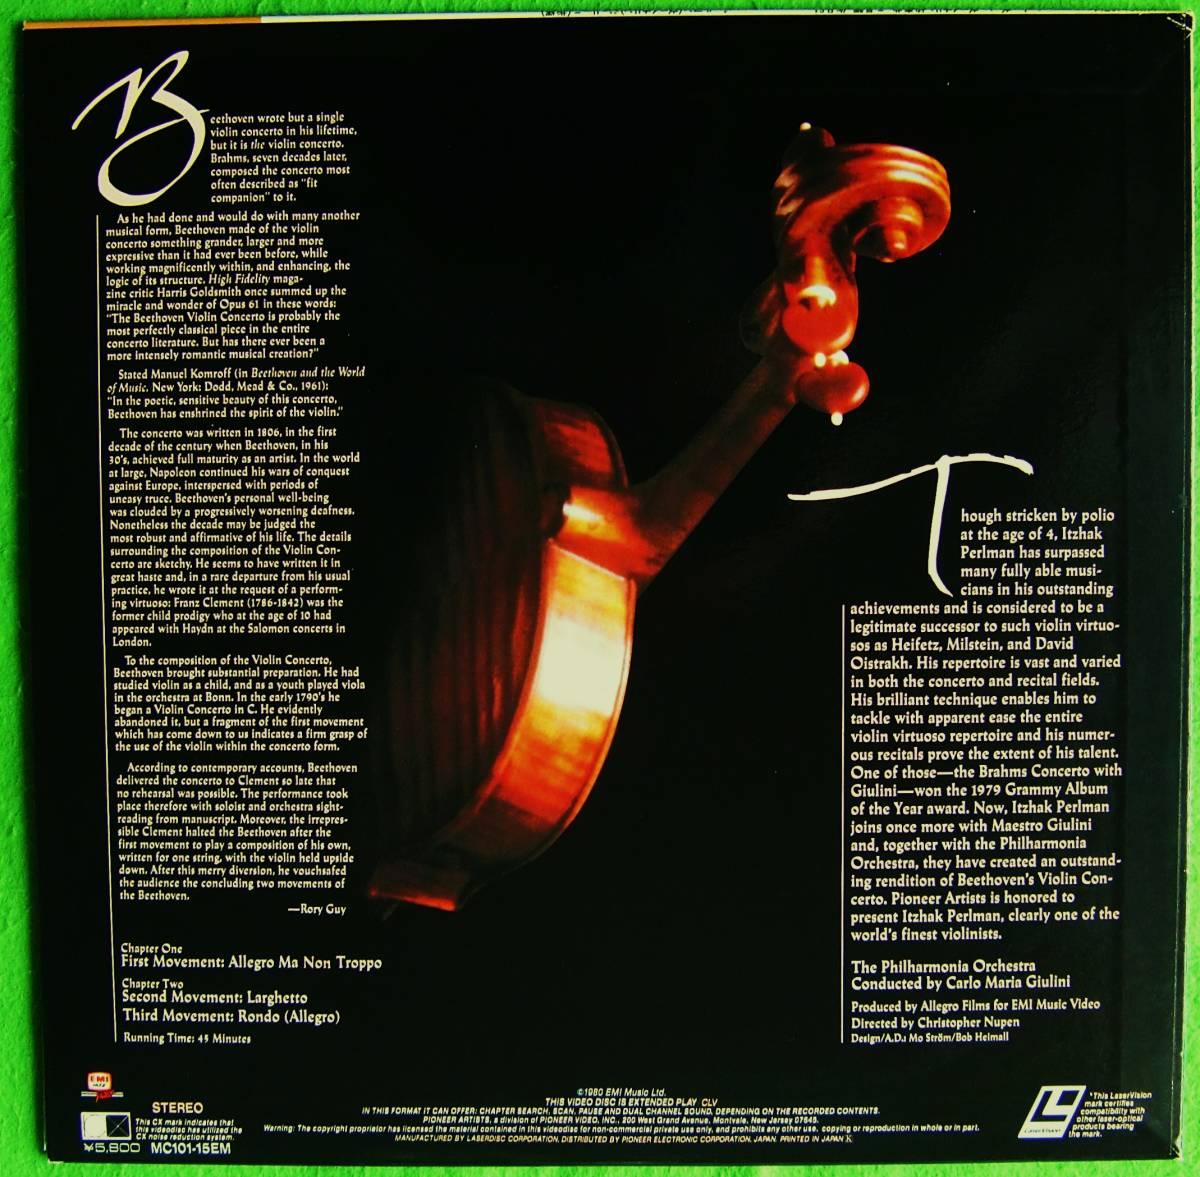 LD: イツァーク・パールマン / ベートーヴェン ヴァイオリン協奏曲 ニ長調 / カルロ・マリア・ジュリーニ 指揮 フィルハーモニア管弦楽団_ジャケット裏面